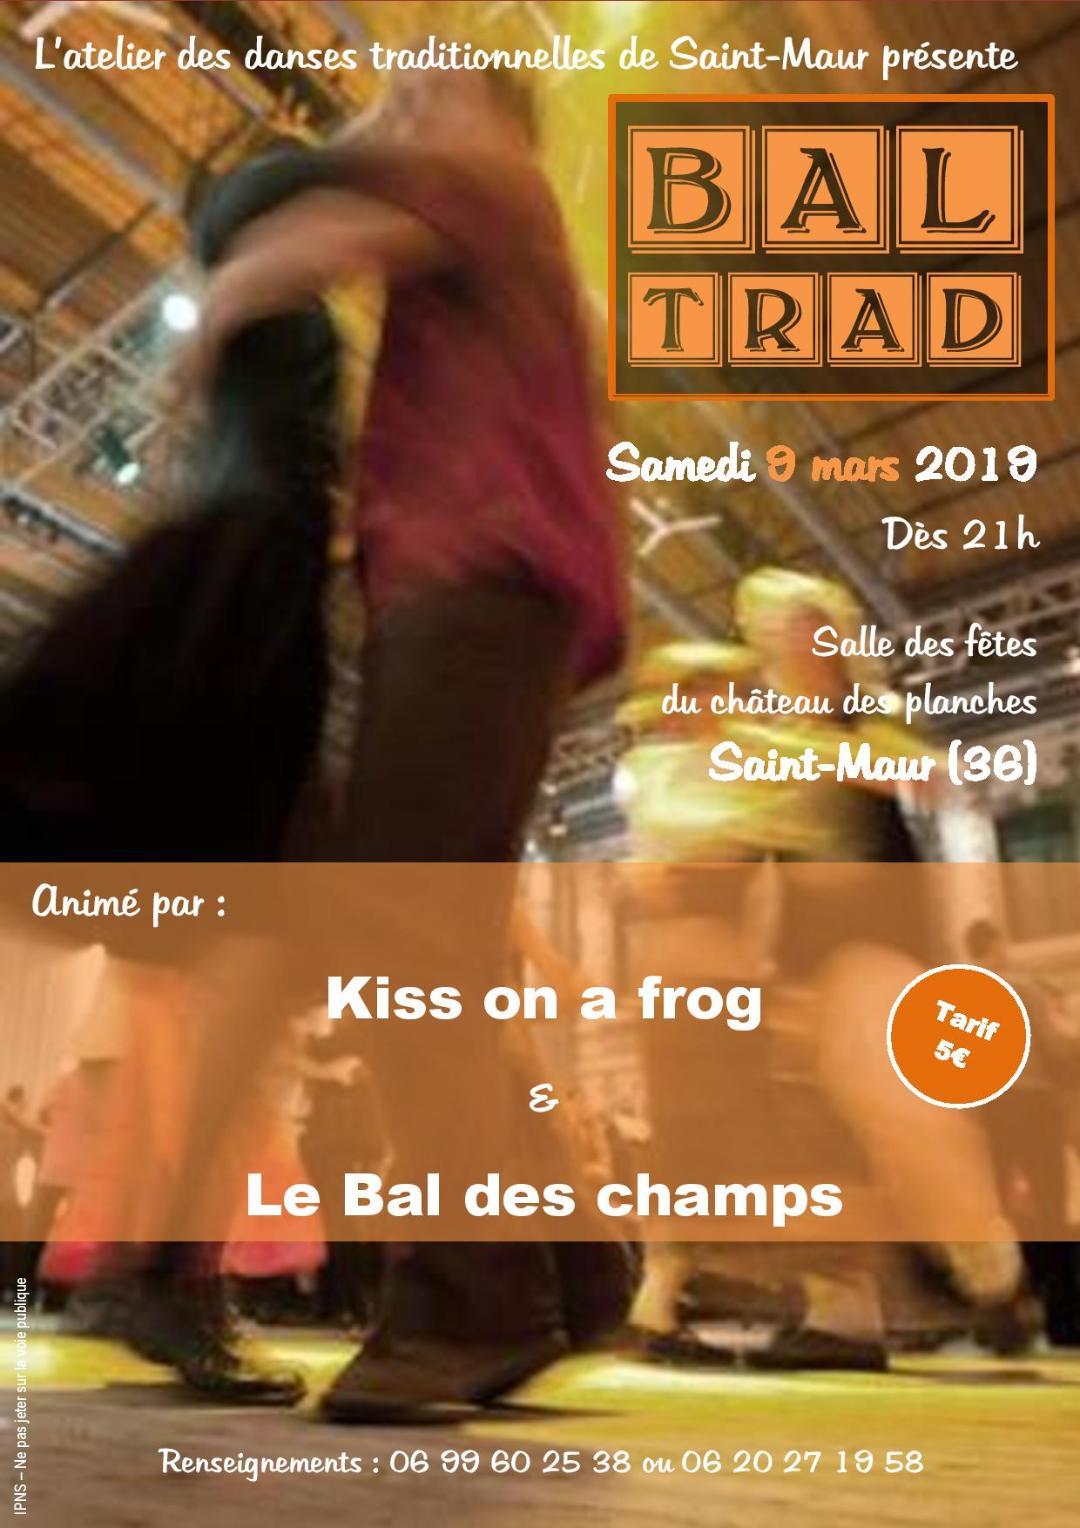 bal-bal-champs-kiss_25082.jpg